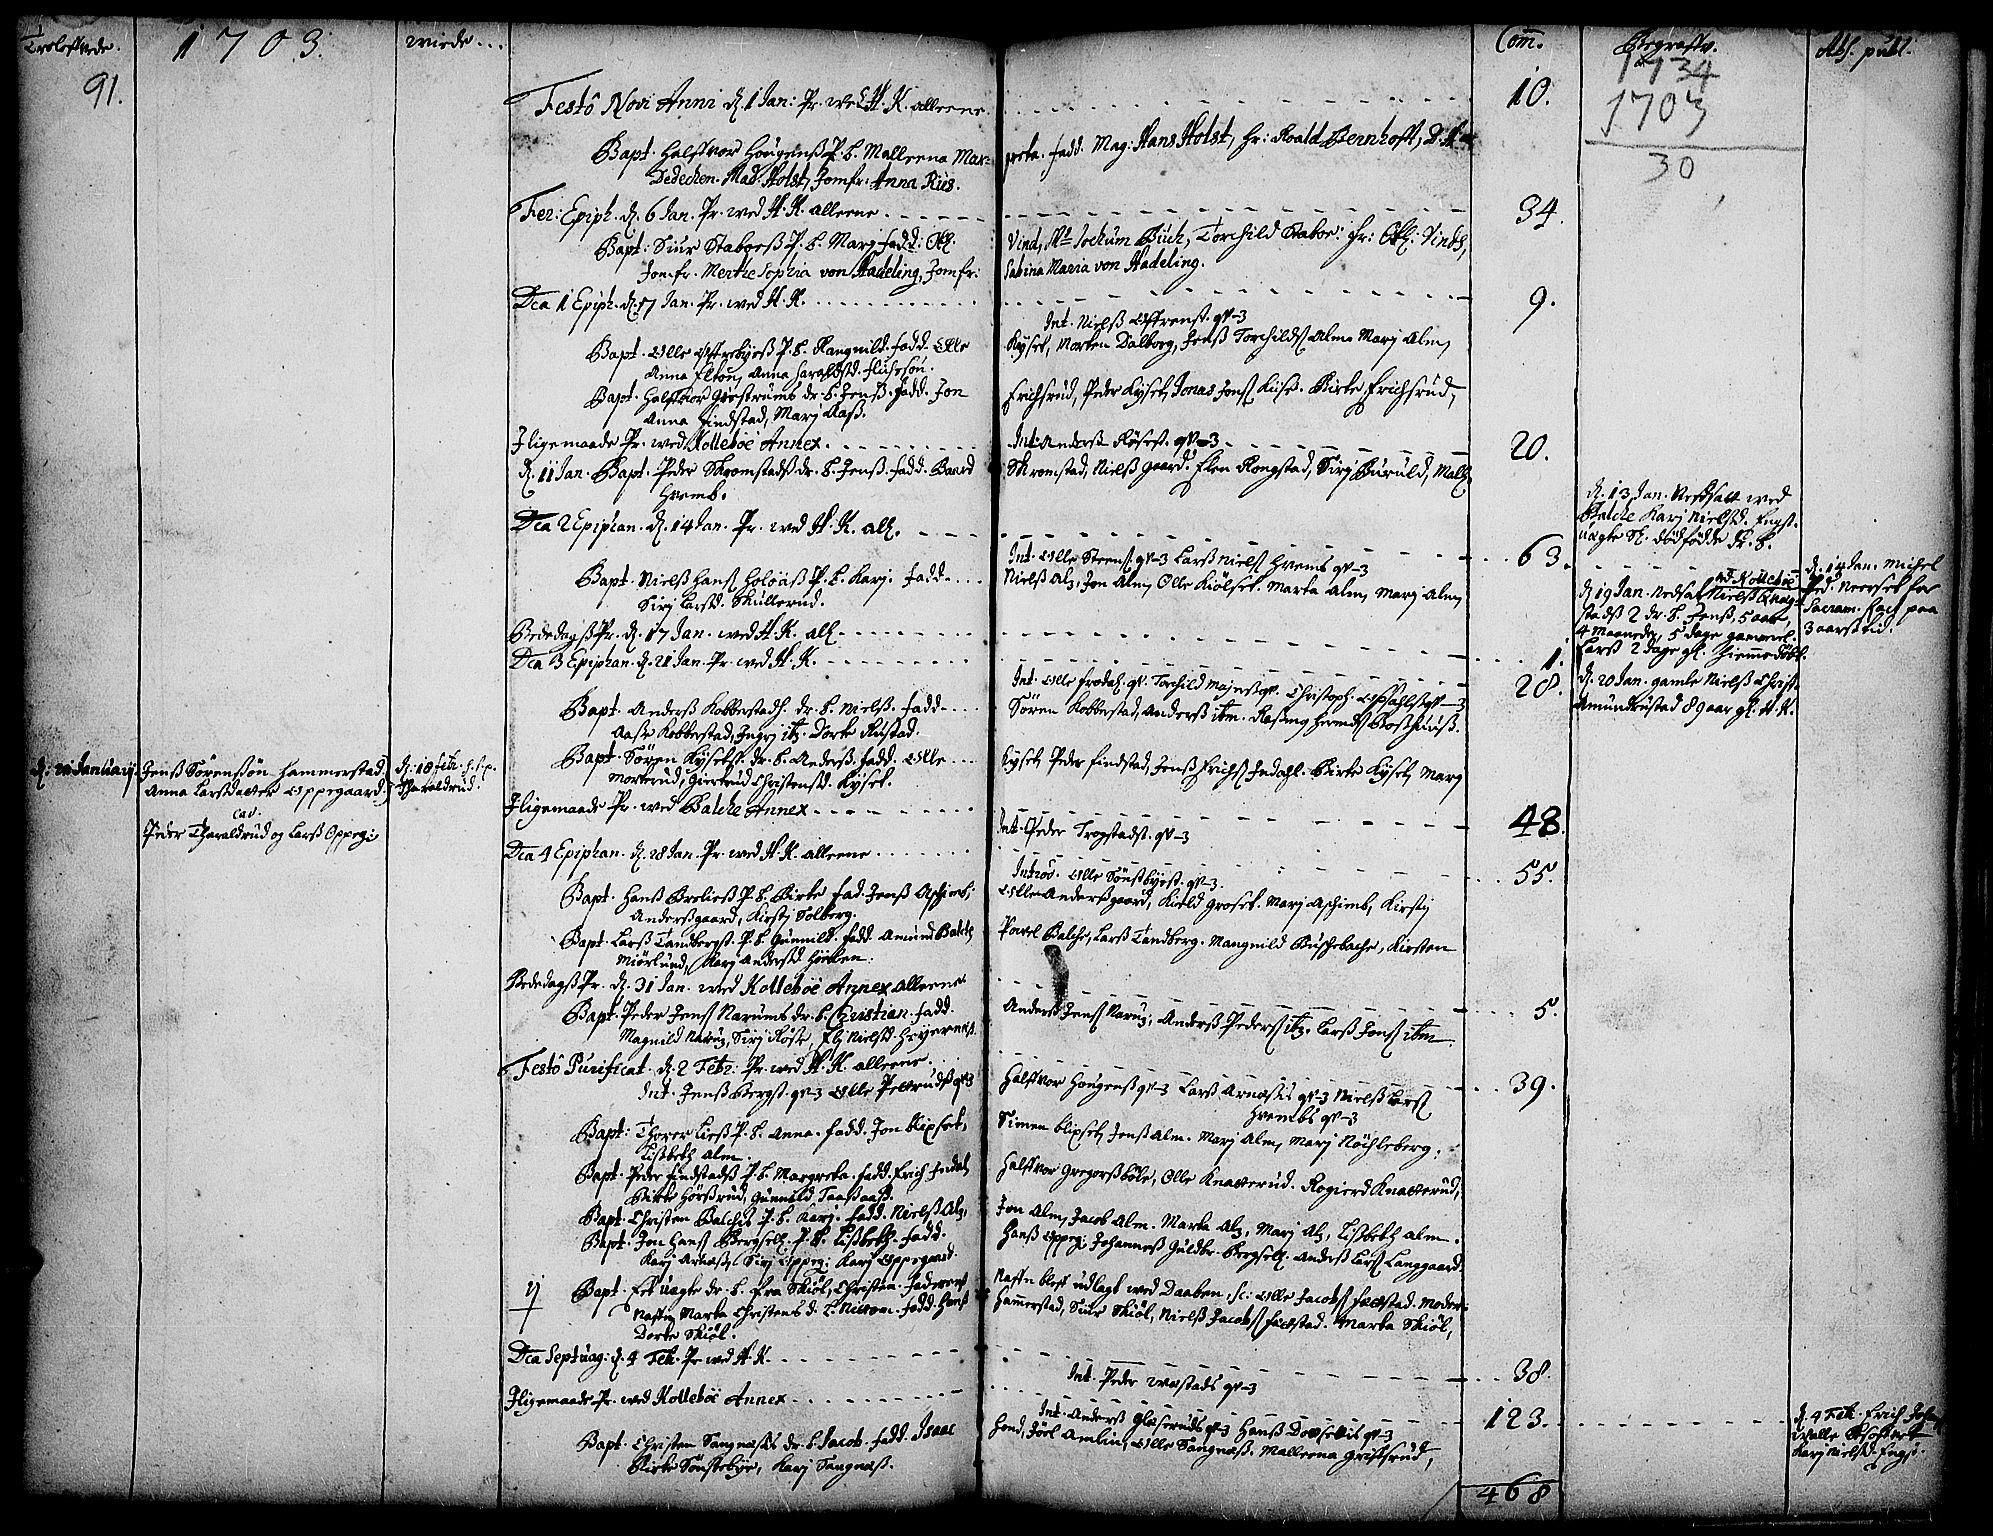 SAH, Toten prestekontor, Ministerialbok nr. 1, 1695-1713, s. 91